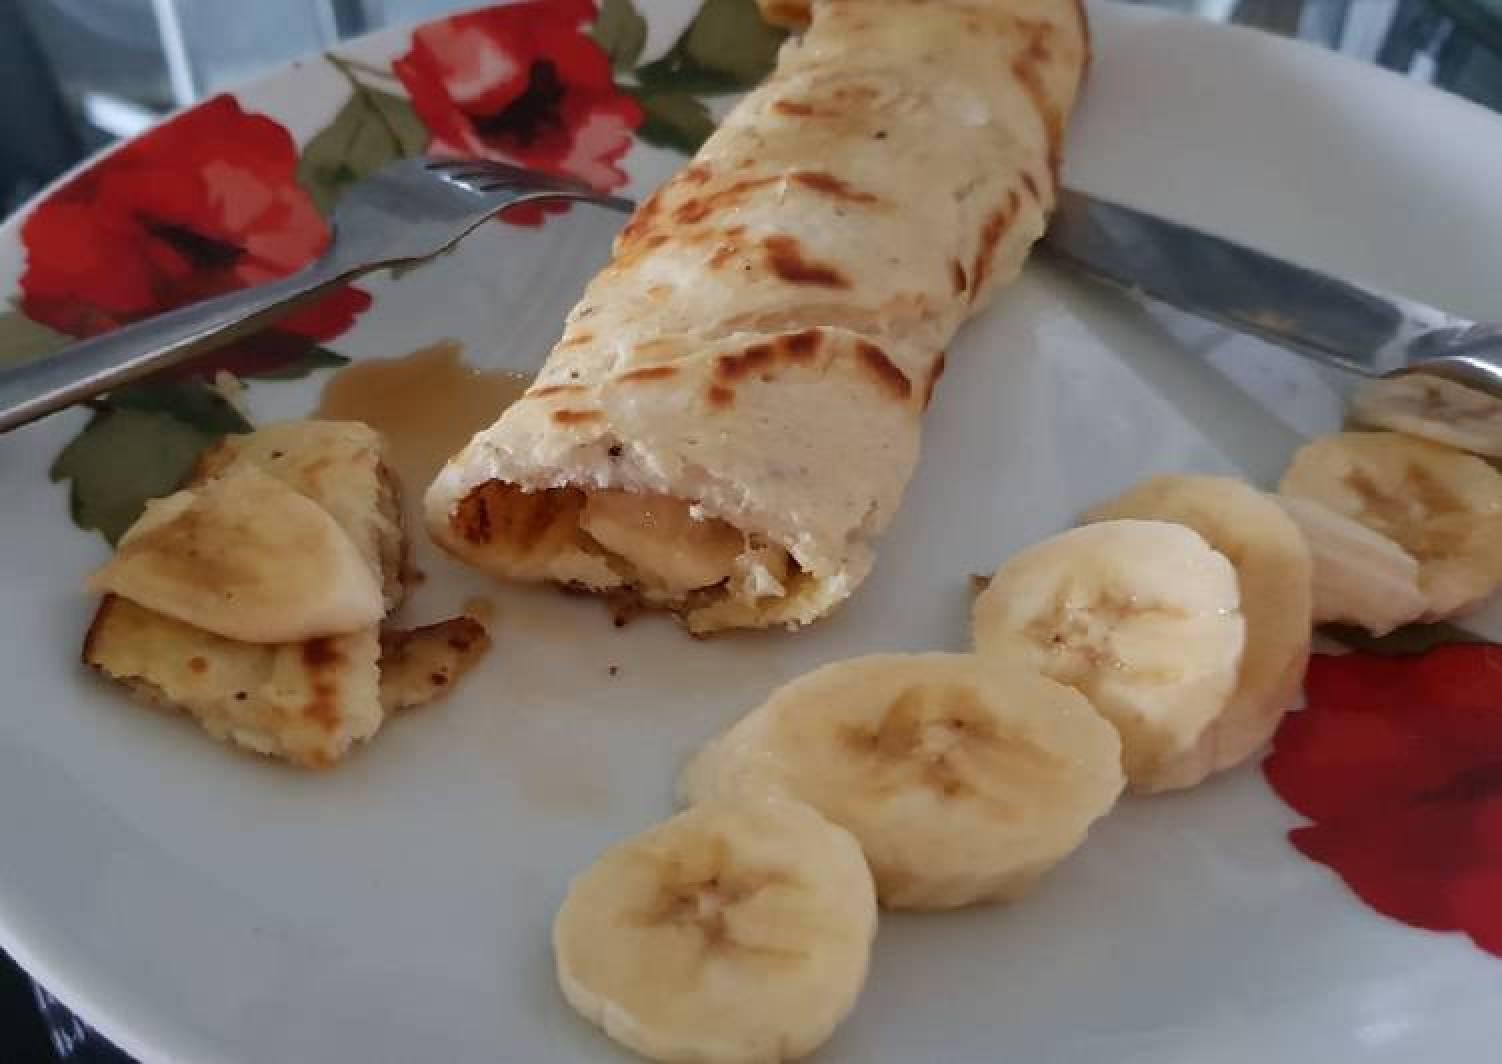 My Banana Cinnamon Pancake Wrap for Breakfast. 💗